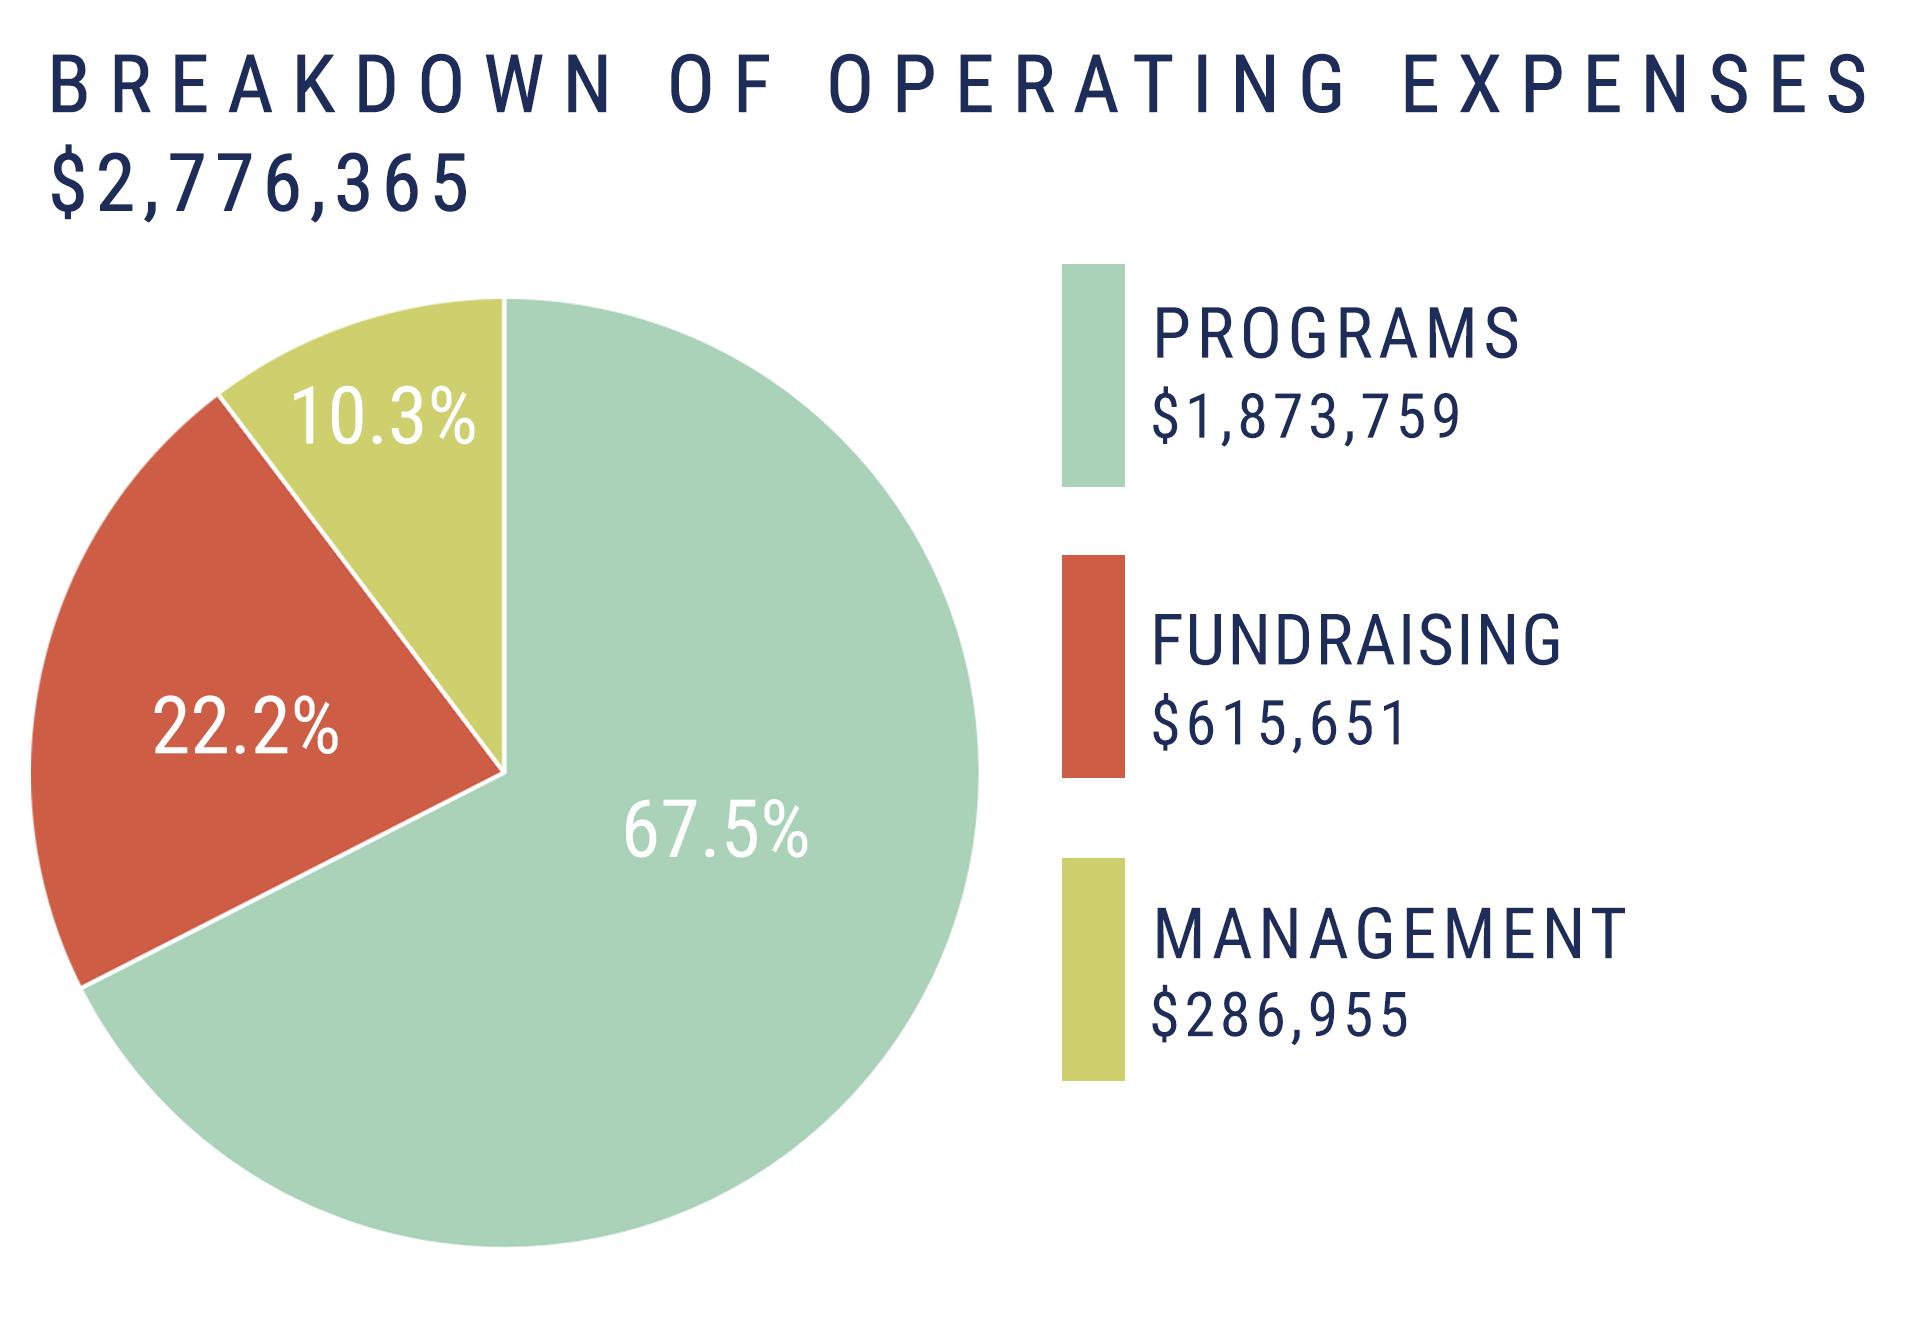 pie-chart_breakdown-of-operating-expenses2020